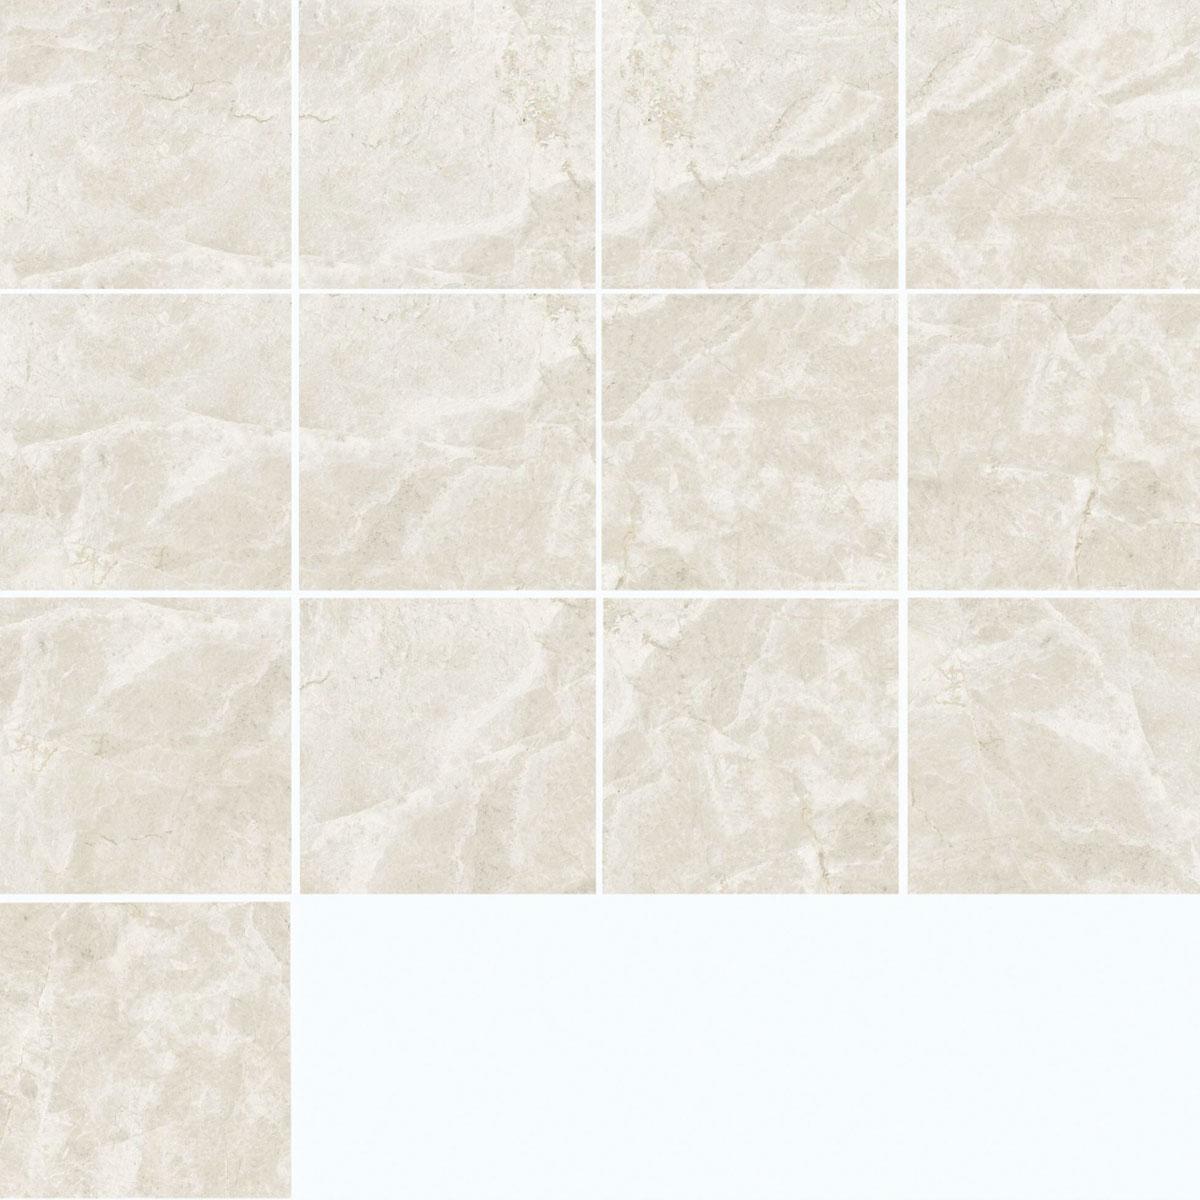 Tundra - Ivory - Marble Look Tiles - Stone3 Brisbane